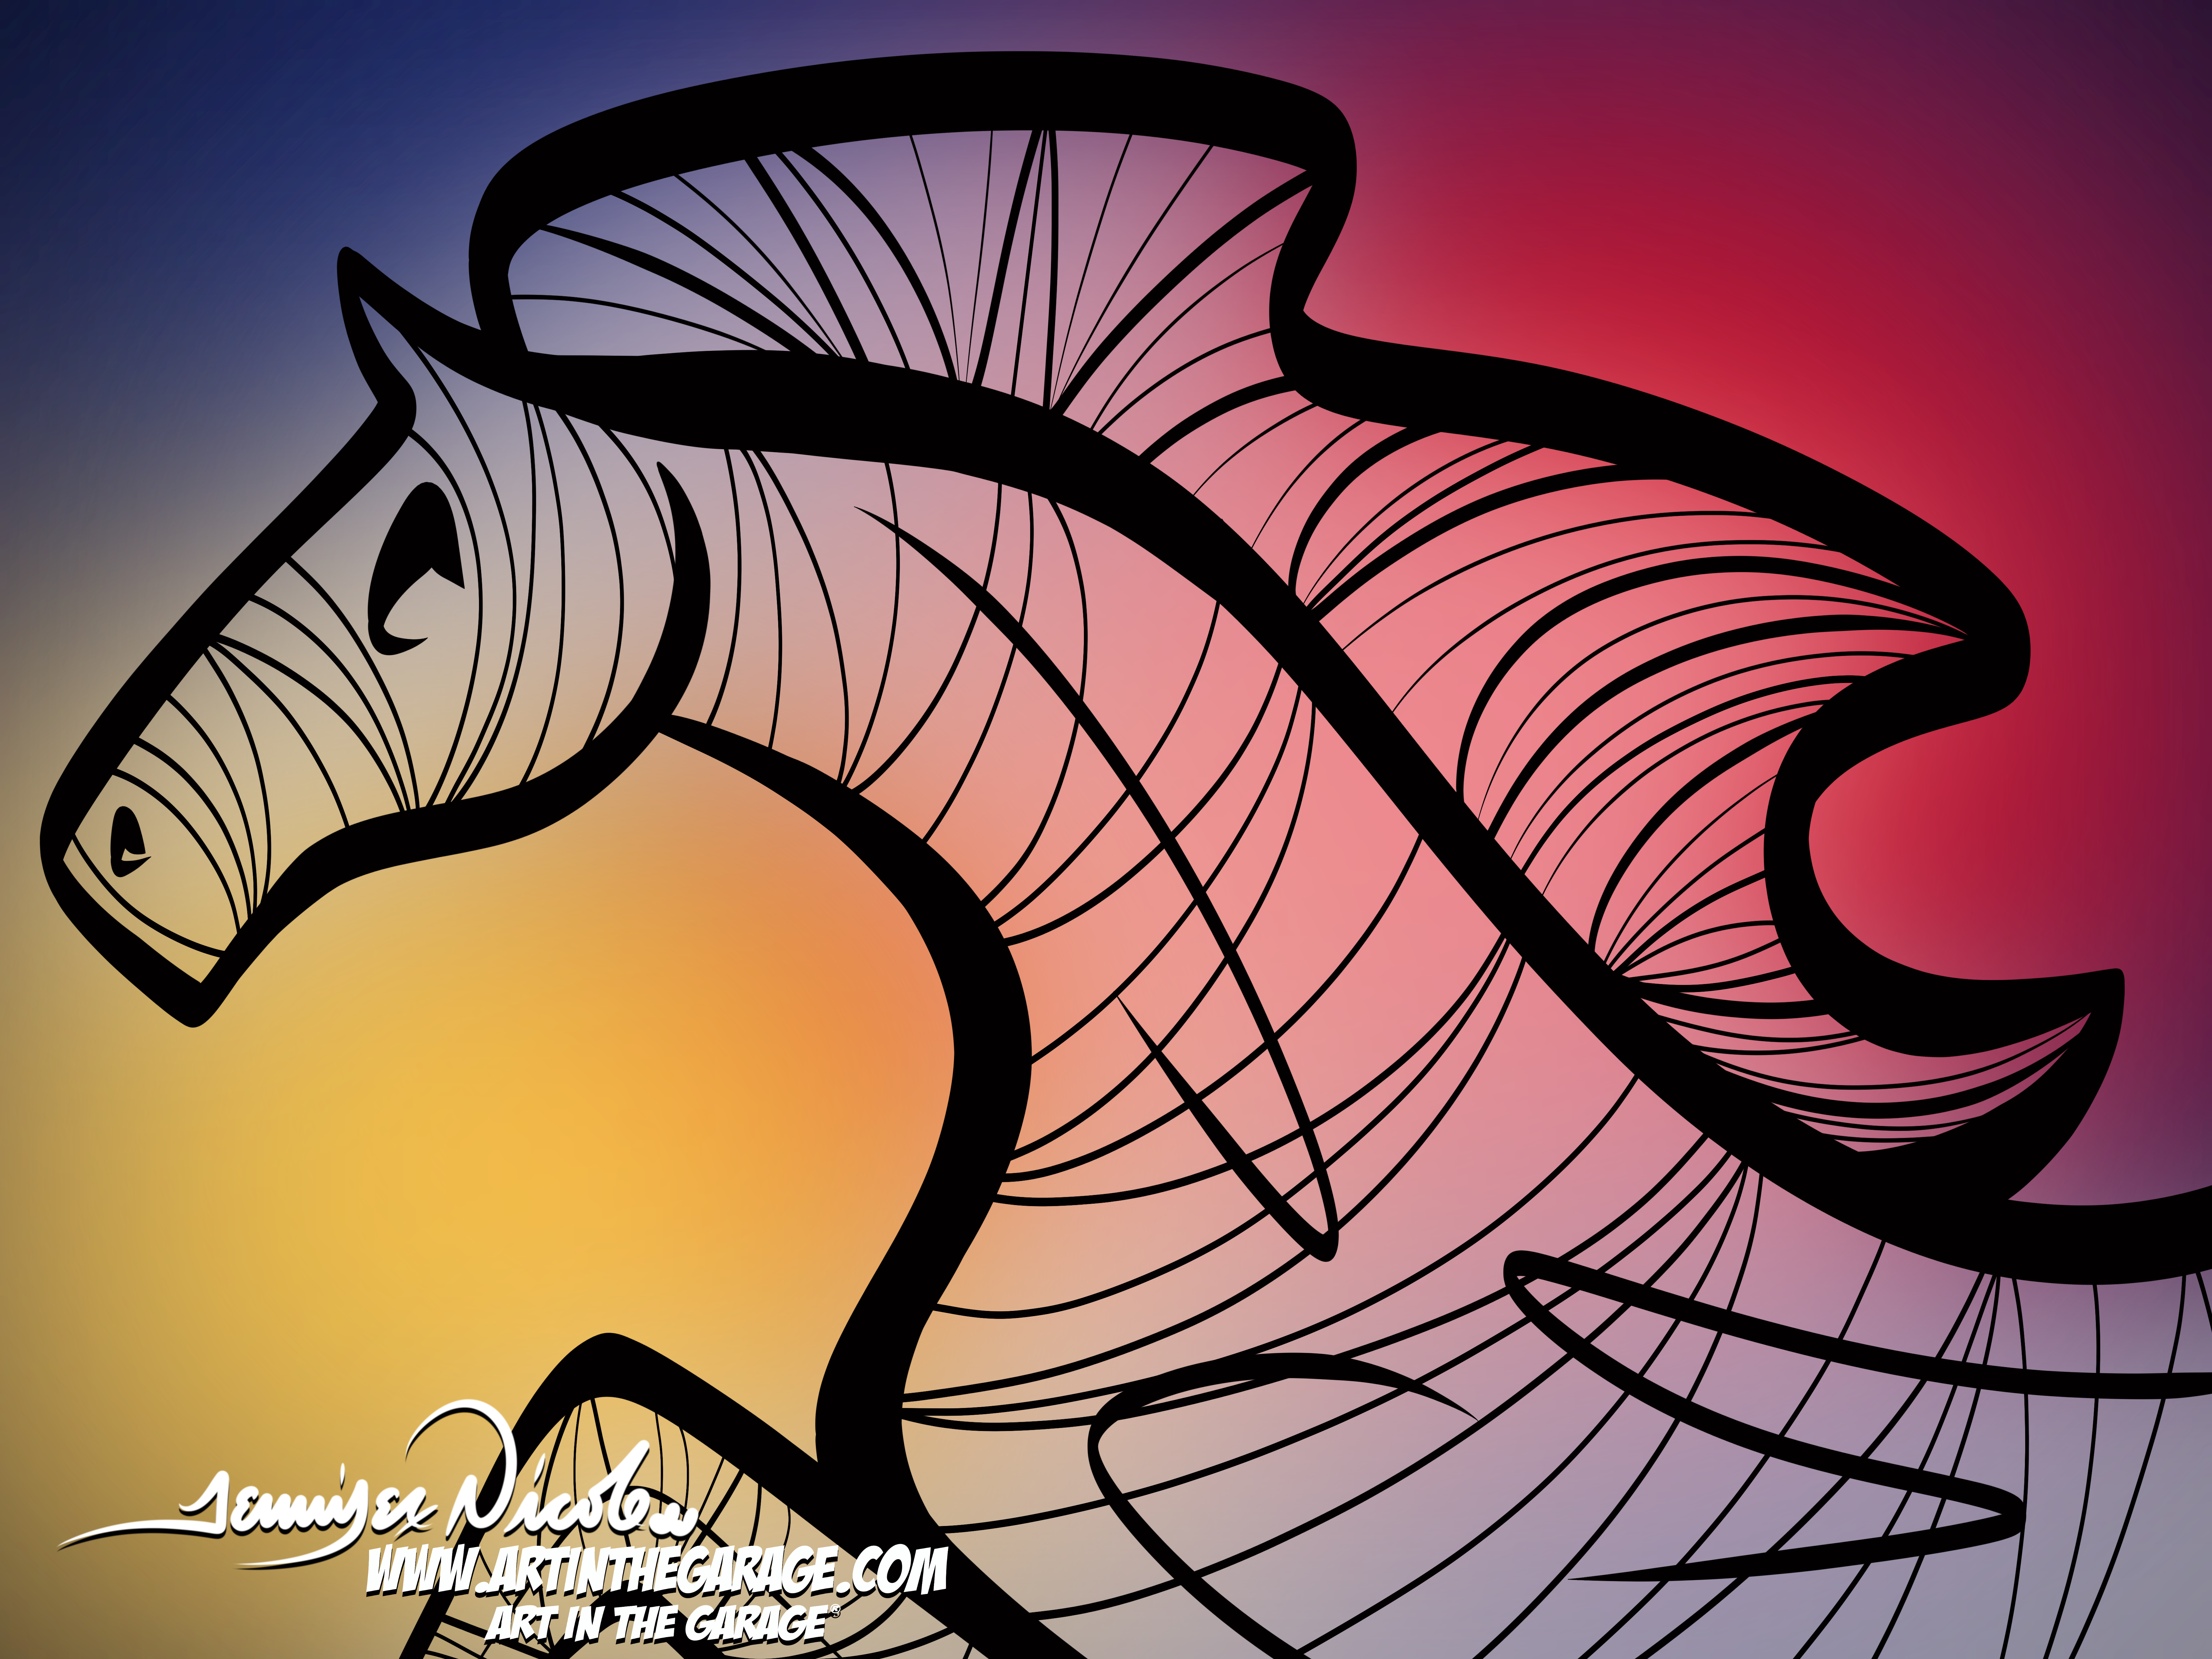 1-21-21 The Minimalistic Horse